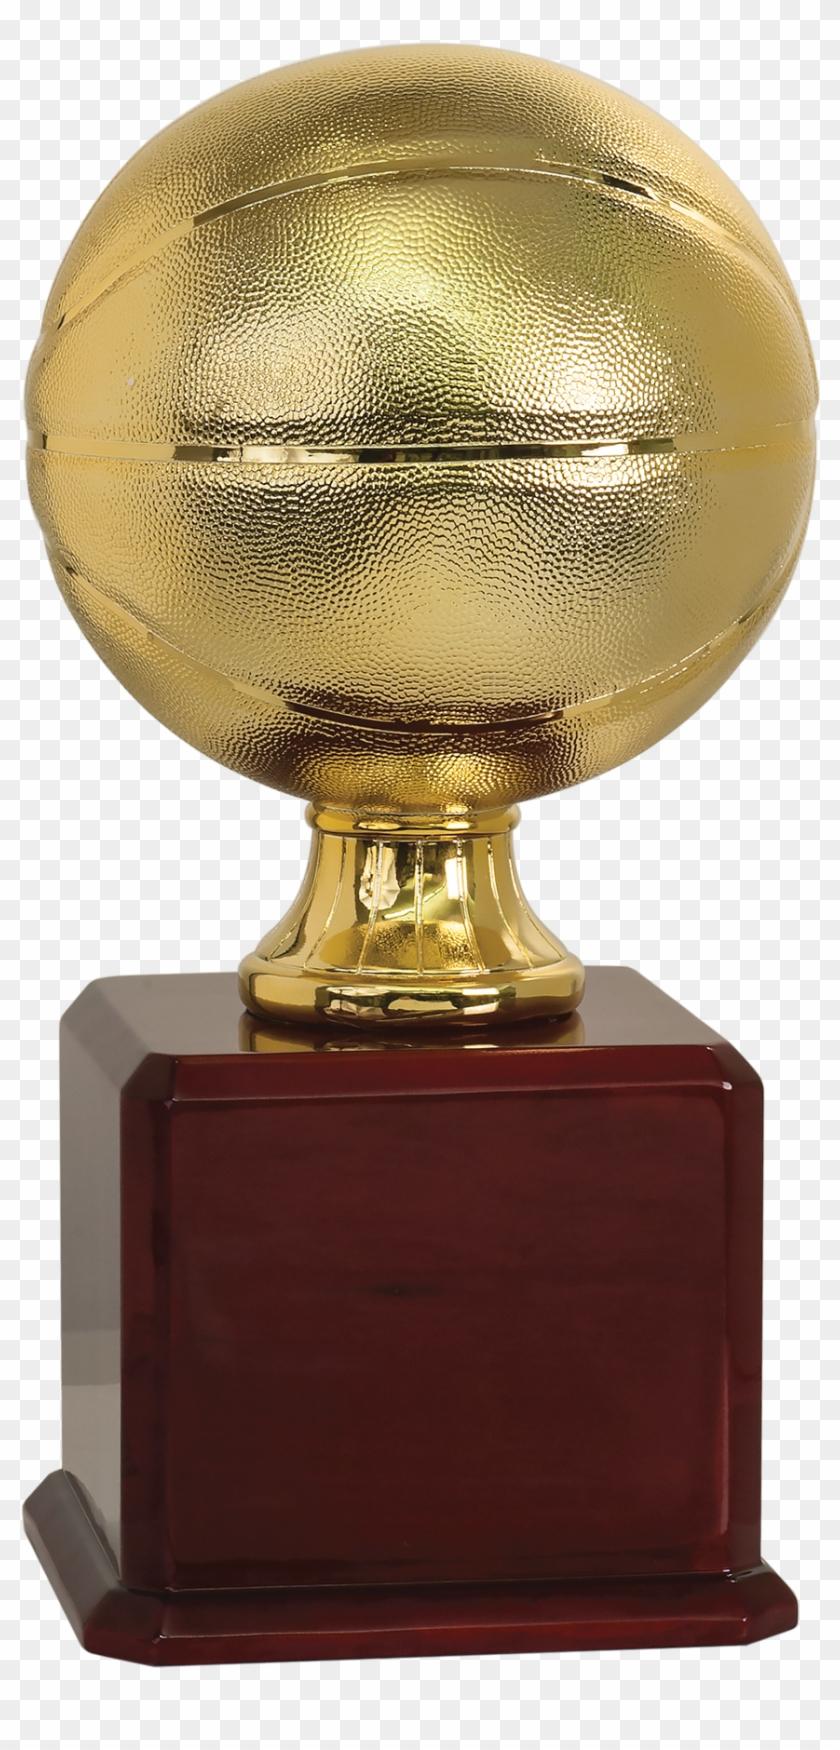 Bright Gold Basketball Trophy - Basketball Trophy